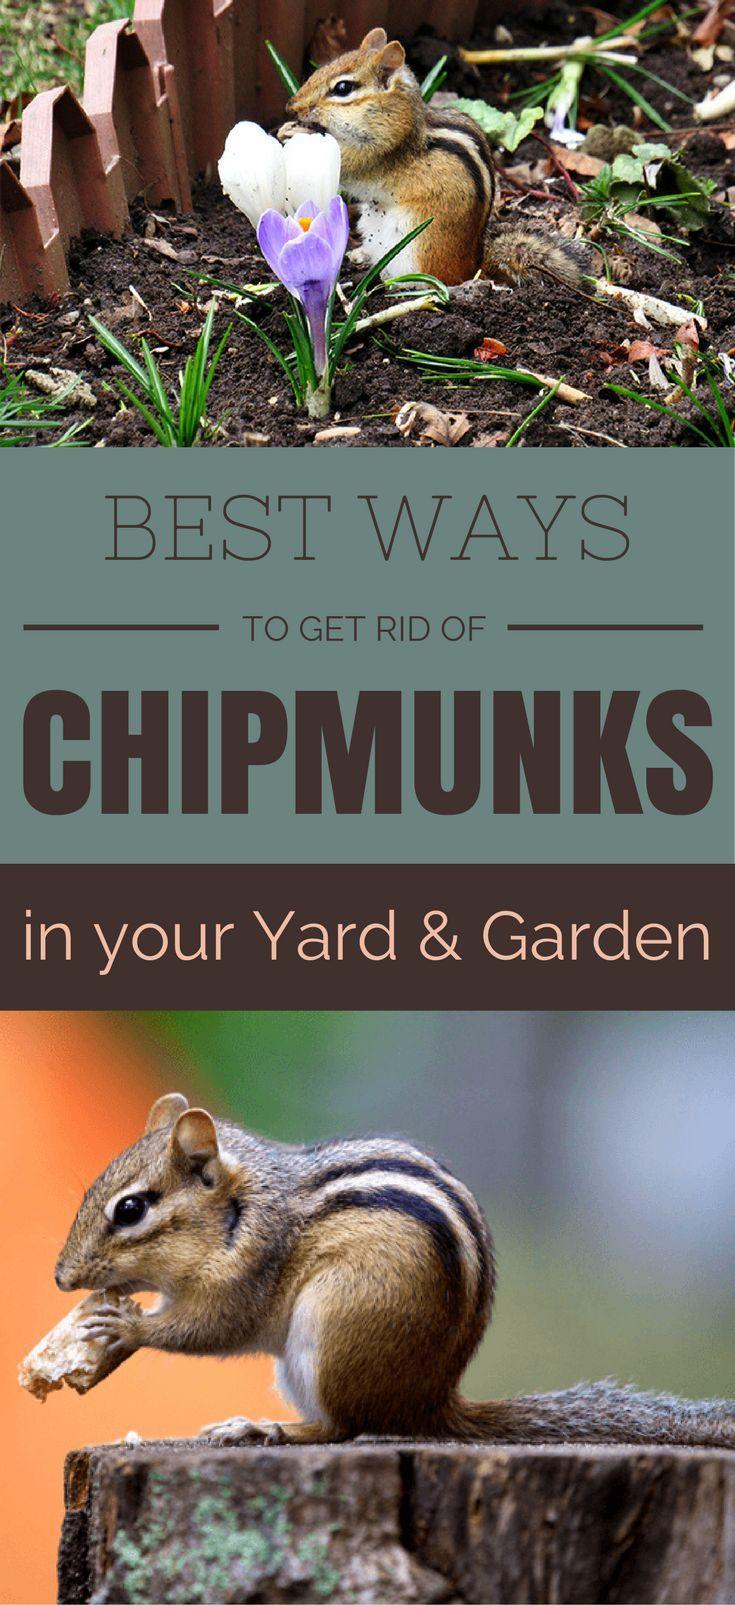 Best ways to get rid of chipmunks in your yard and garden ...